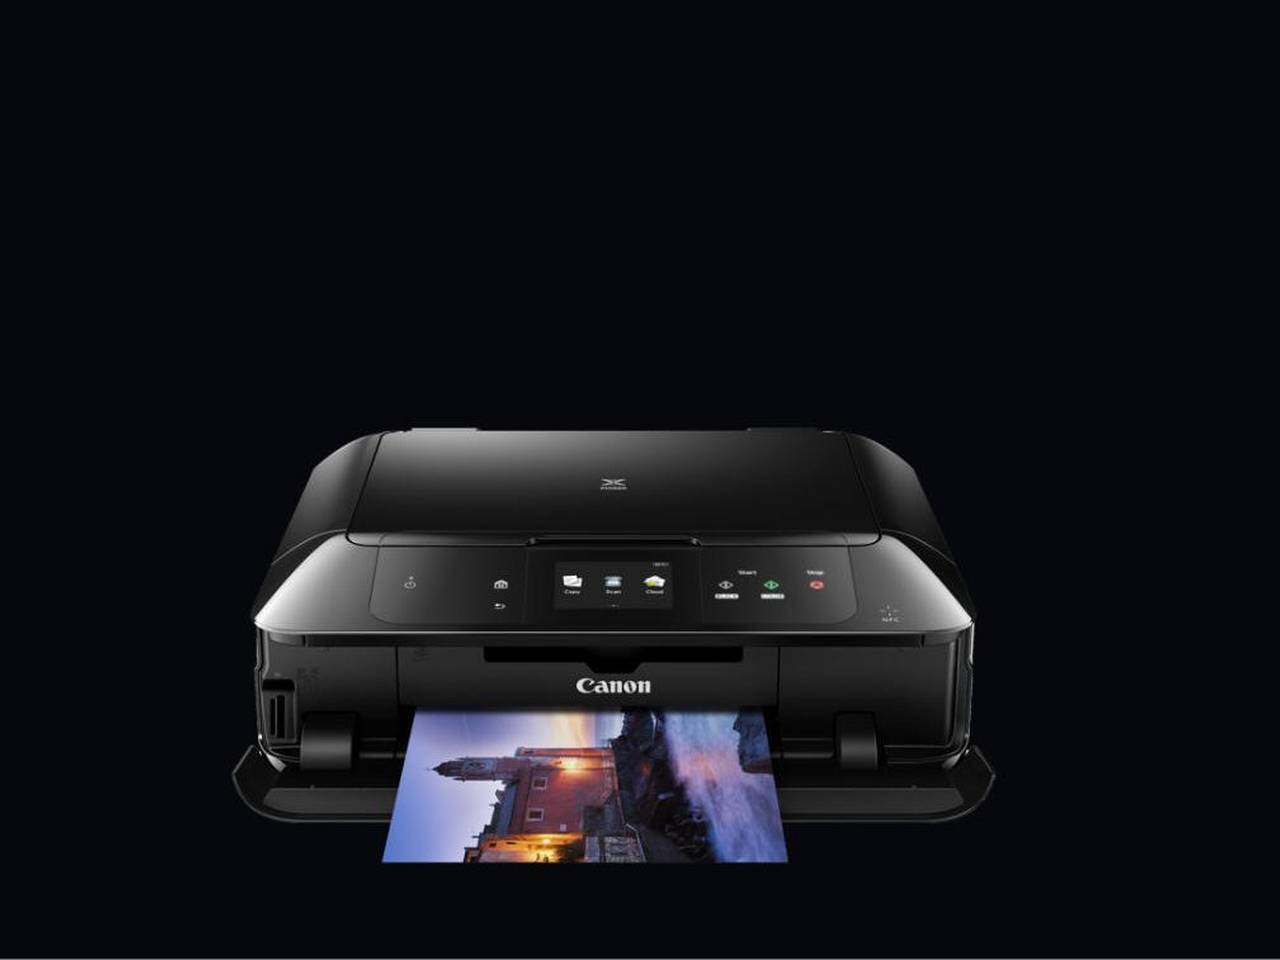 Impresoras de inyeccion de tinta pixma canon espa a for Scale pixima